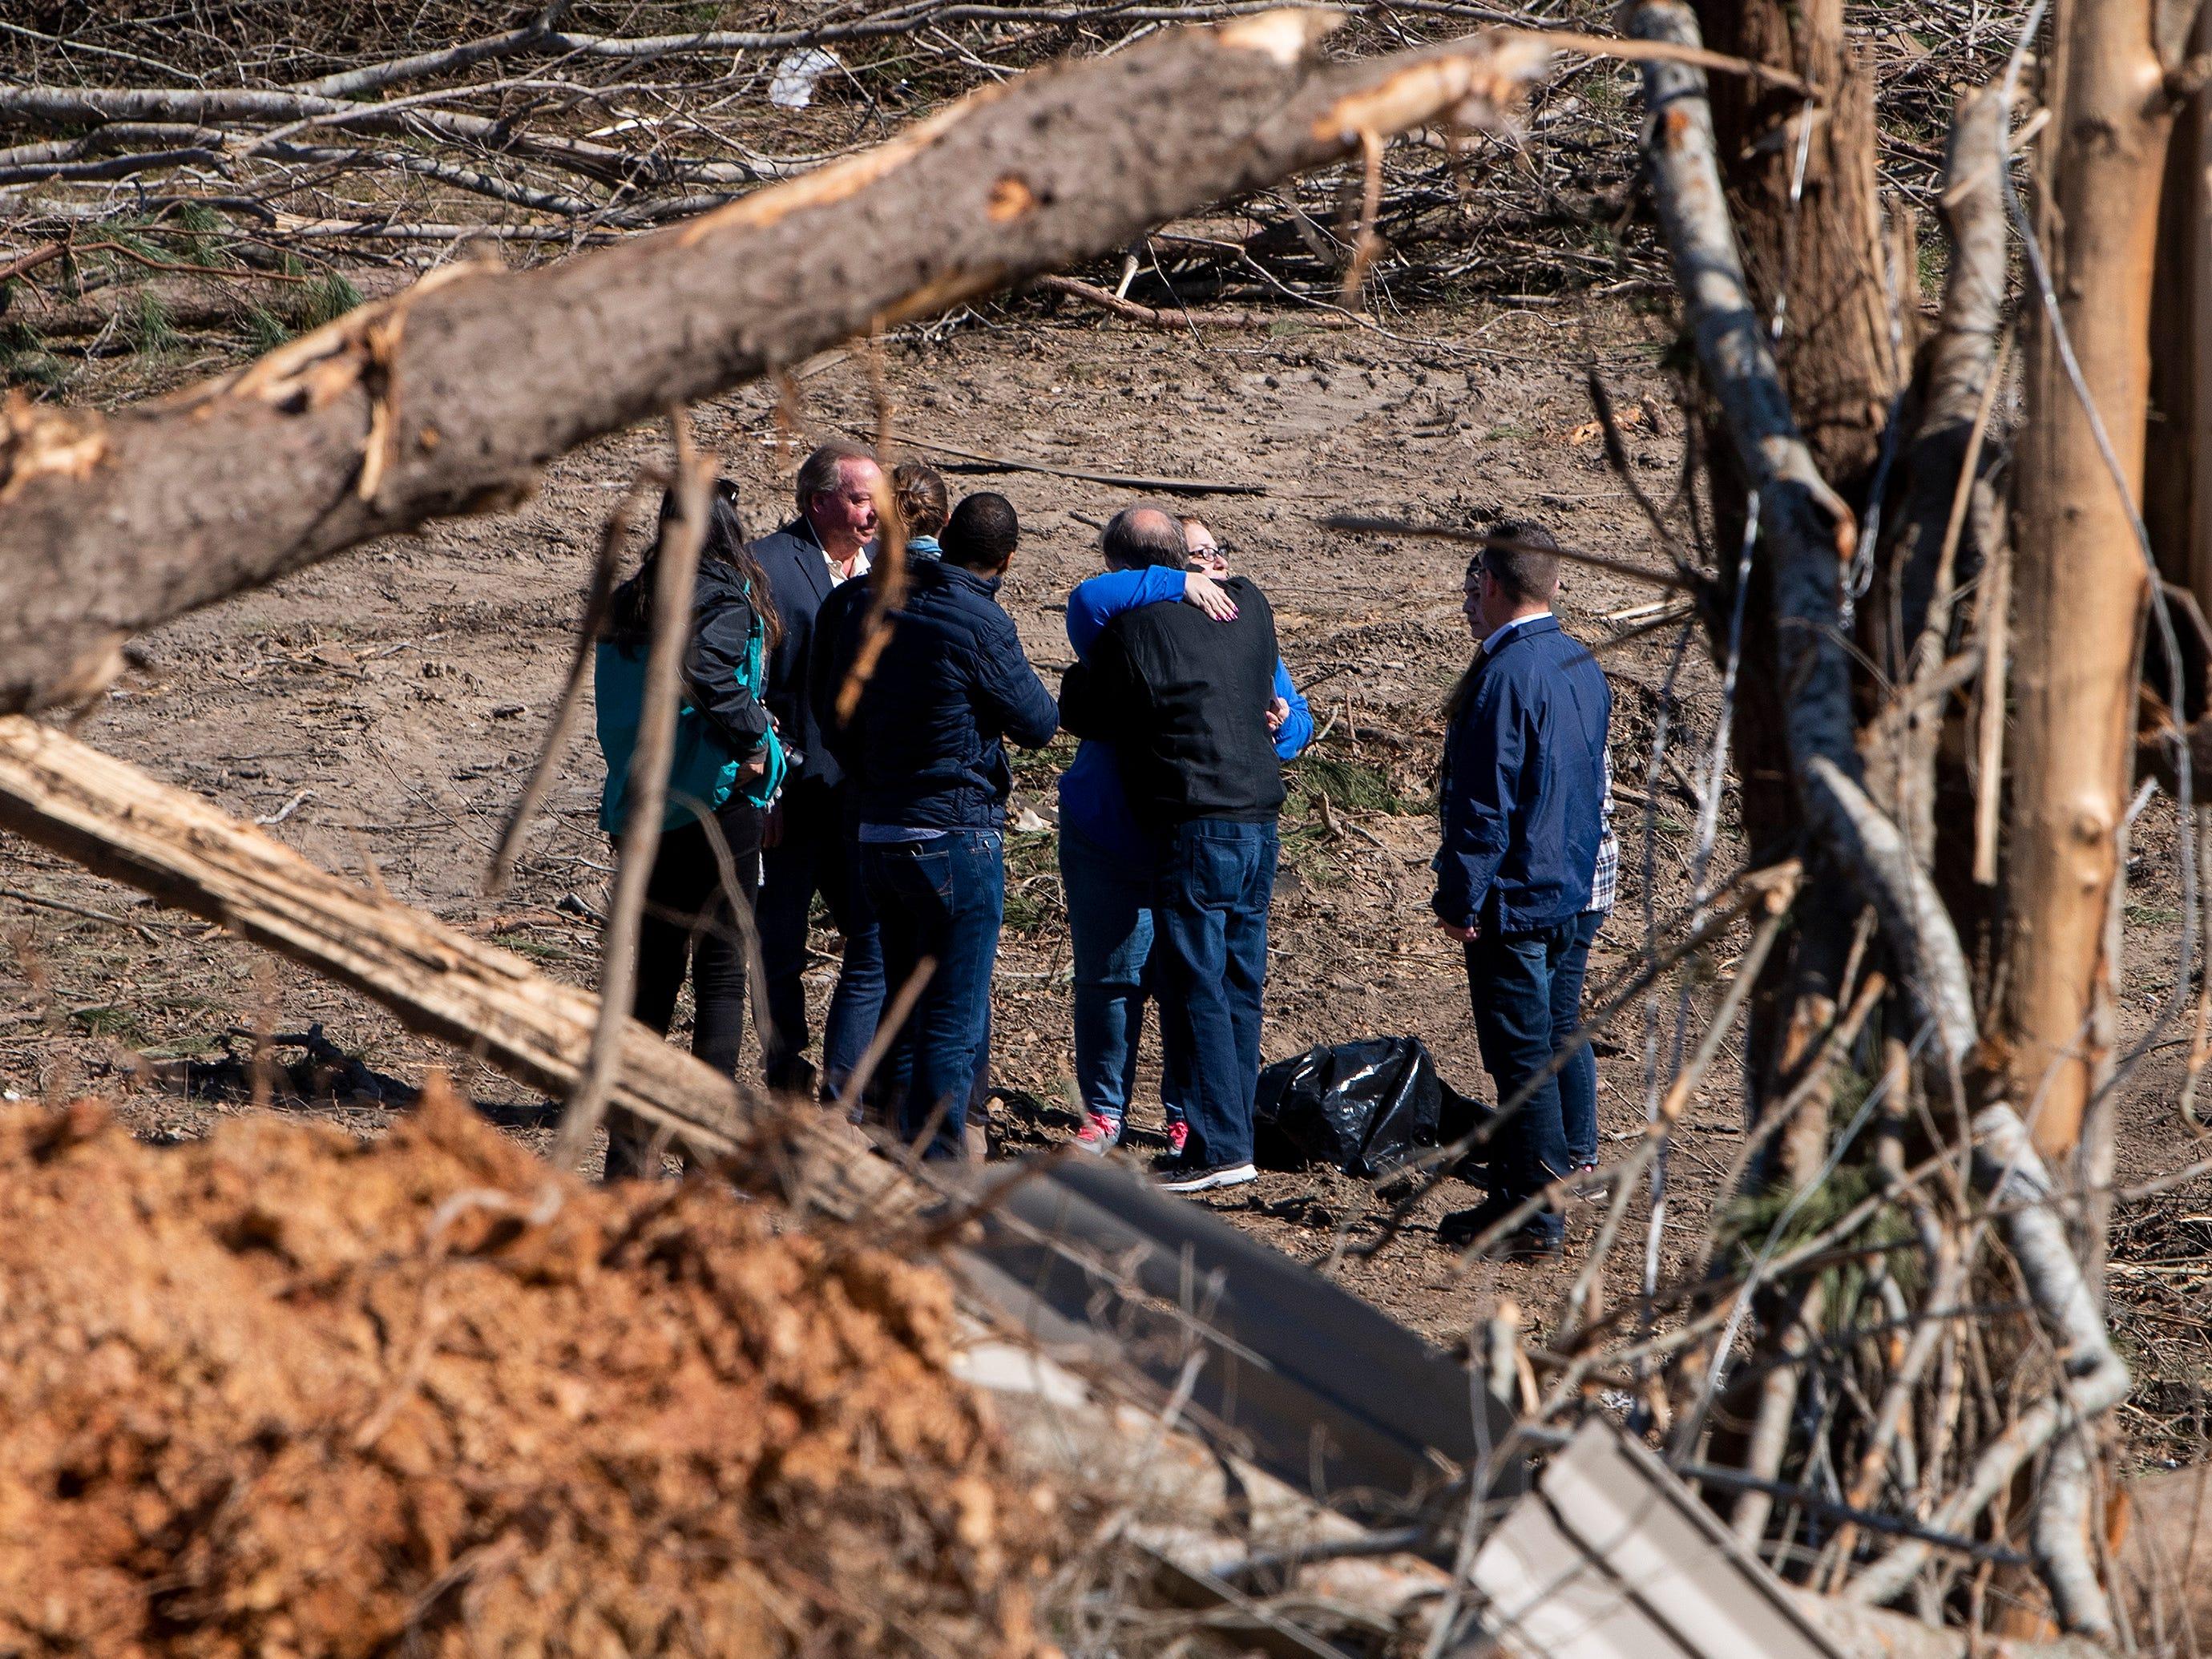 Sen. Doug Jones, D-Ala., hugs a resident as he tours tornado damage in Beauregard, Ala., on March 7, 2019.